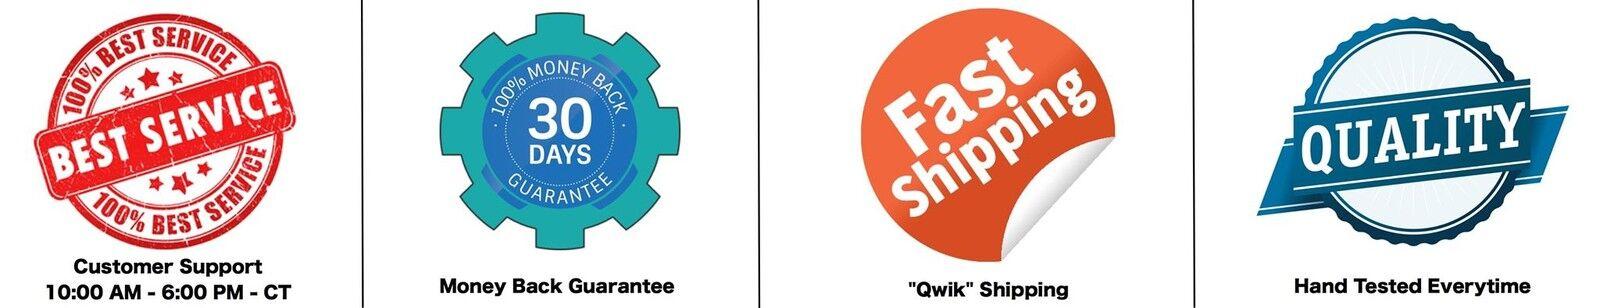 Qwikola